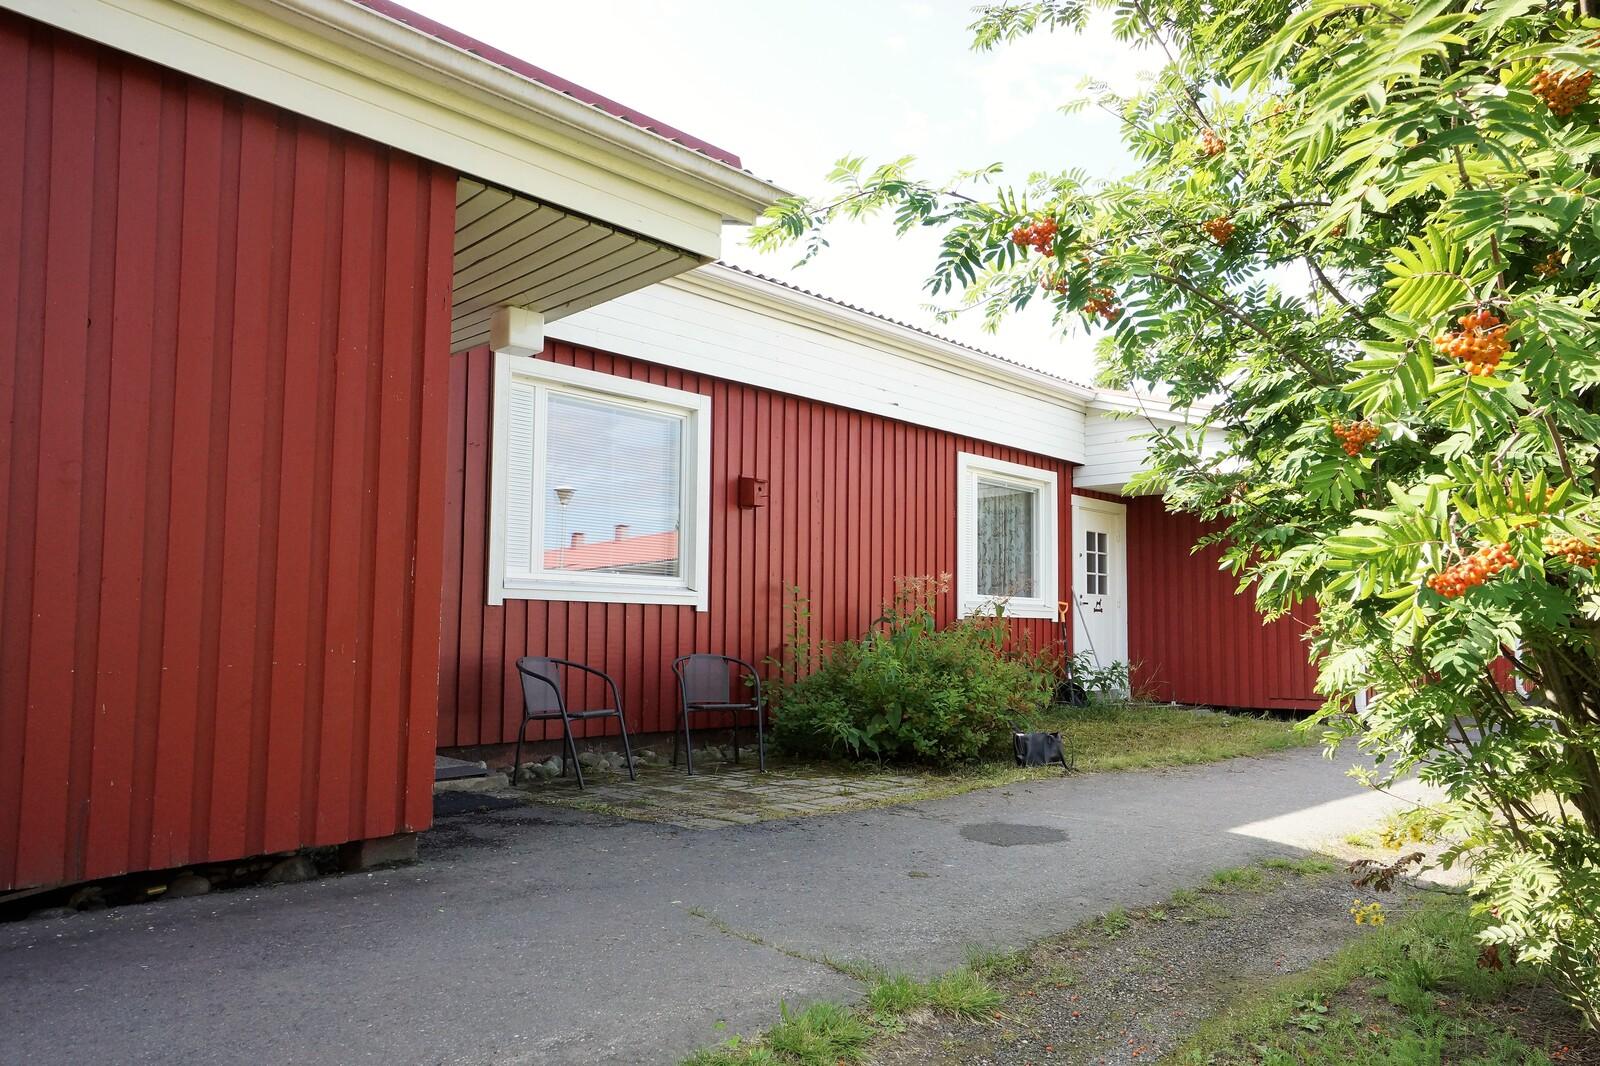 Kiviniemi, Oulu